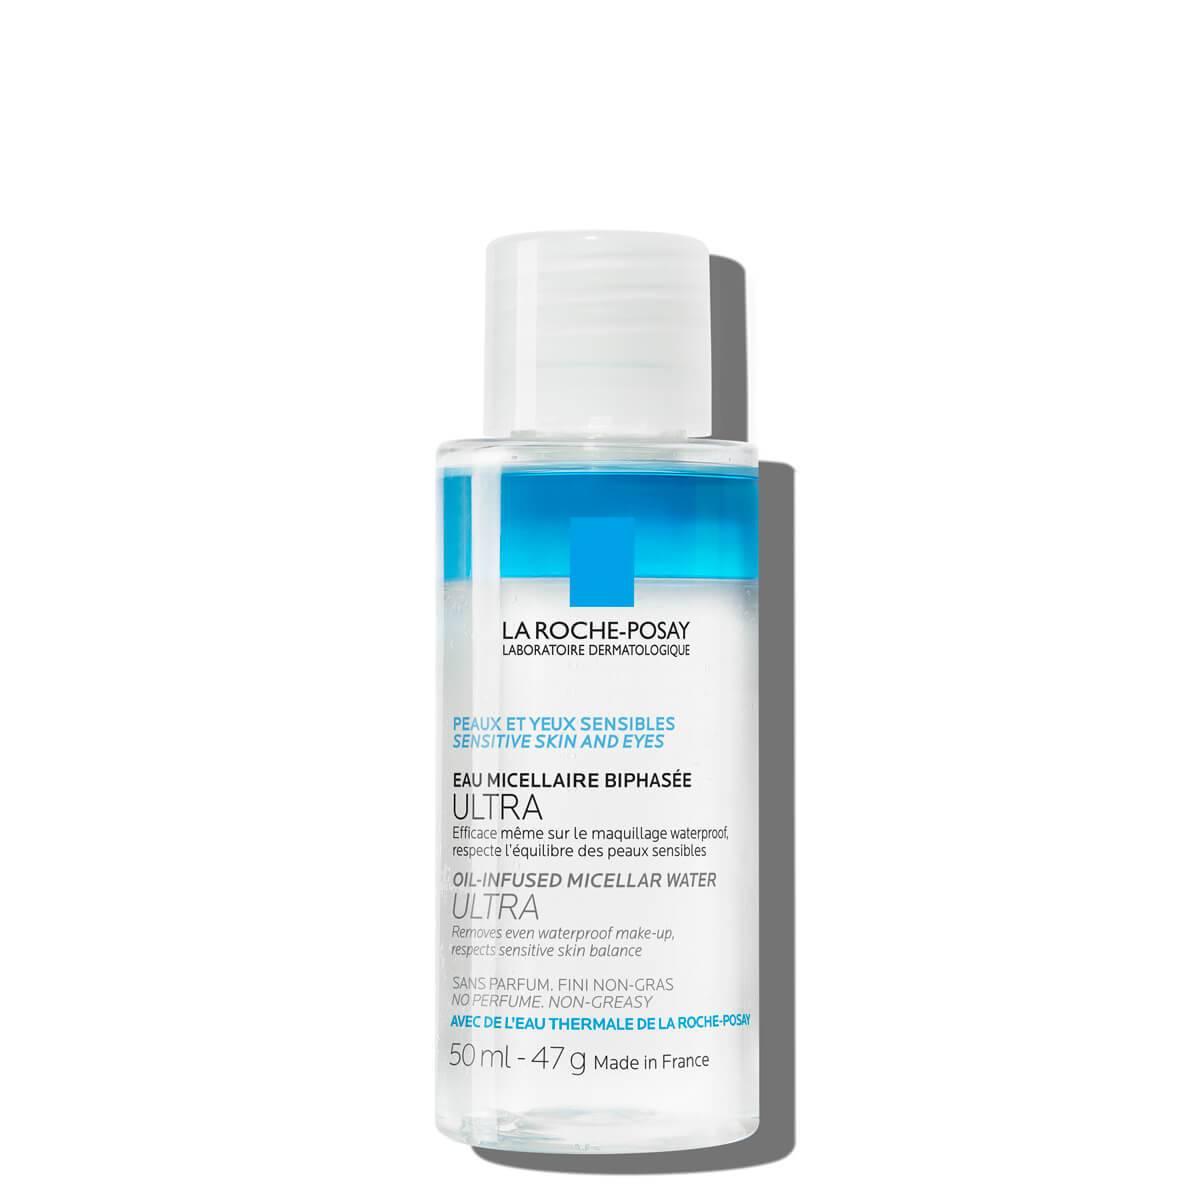 LaRochePosay-Produkt-Oblicej-Fyziologicky-Olej-Obohaceny-Micelarni-Vodou-Ultra-50ml-3337875725934-FSS